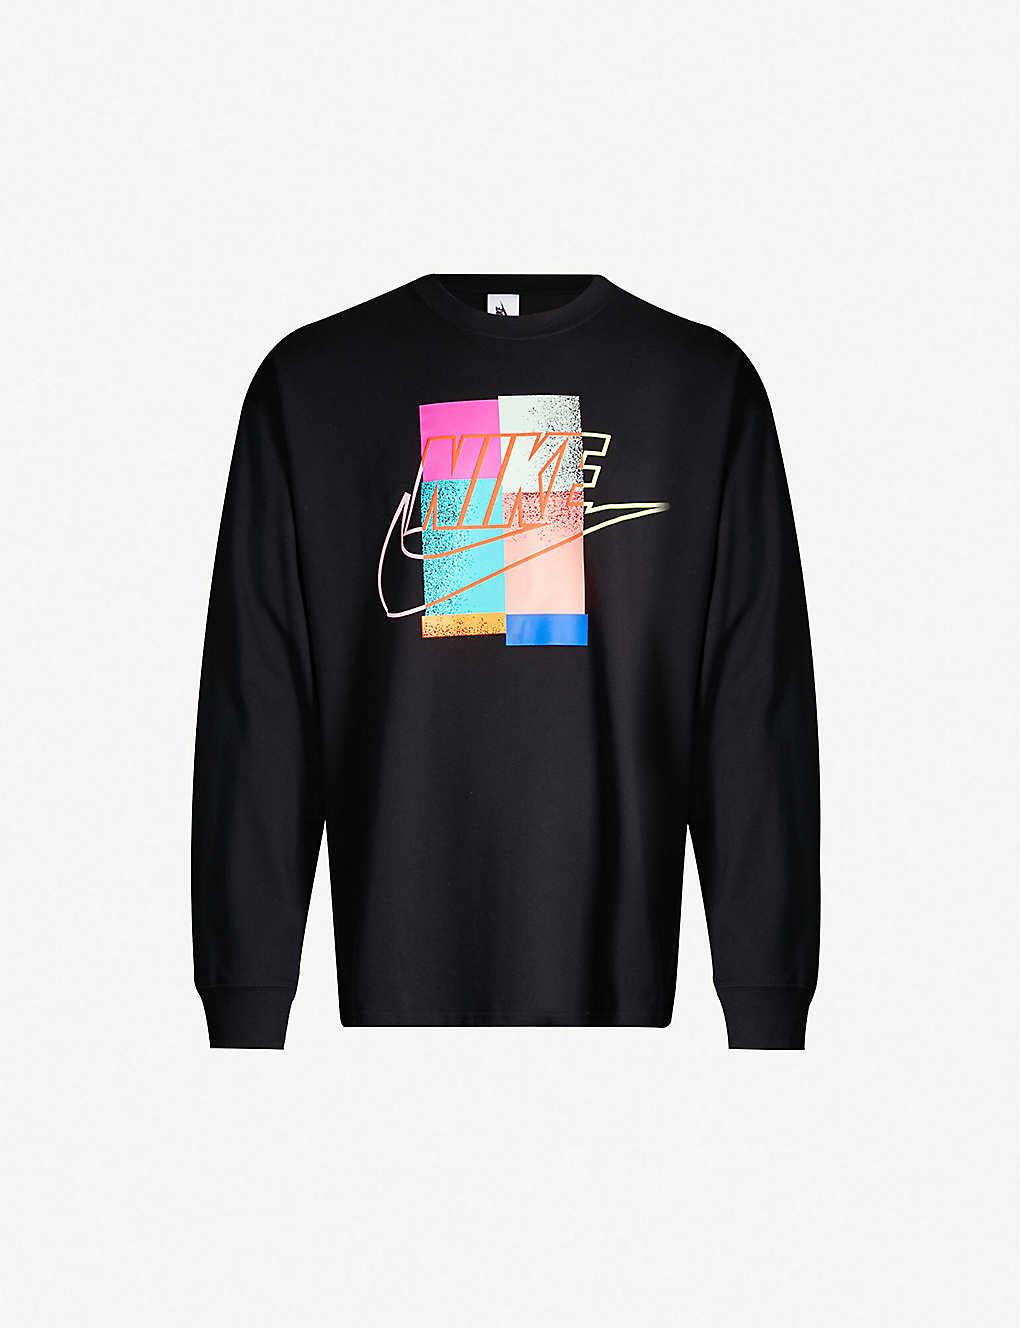 Cotton Nike X Atmos Print Jersey Graphic Sweatshirt wN8v0mn